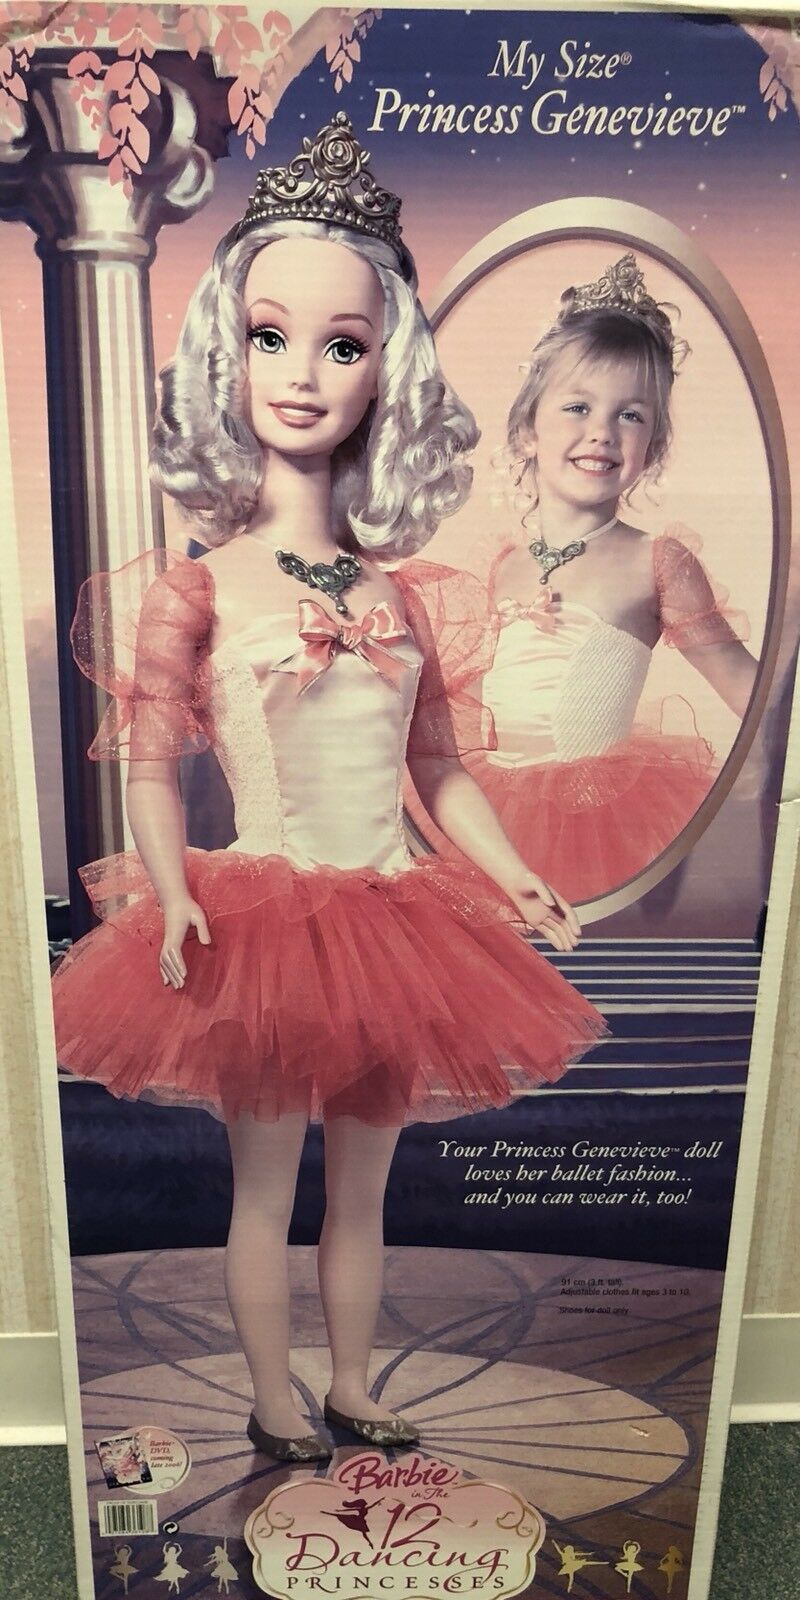 2006 Princesa Genevieve Barbie Mi Tamaño en Die 12 tanzenden Prinzessinen nunca quitado de la caja